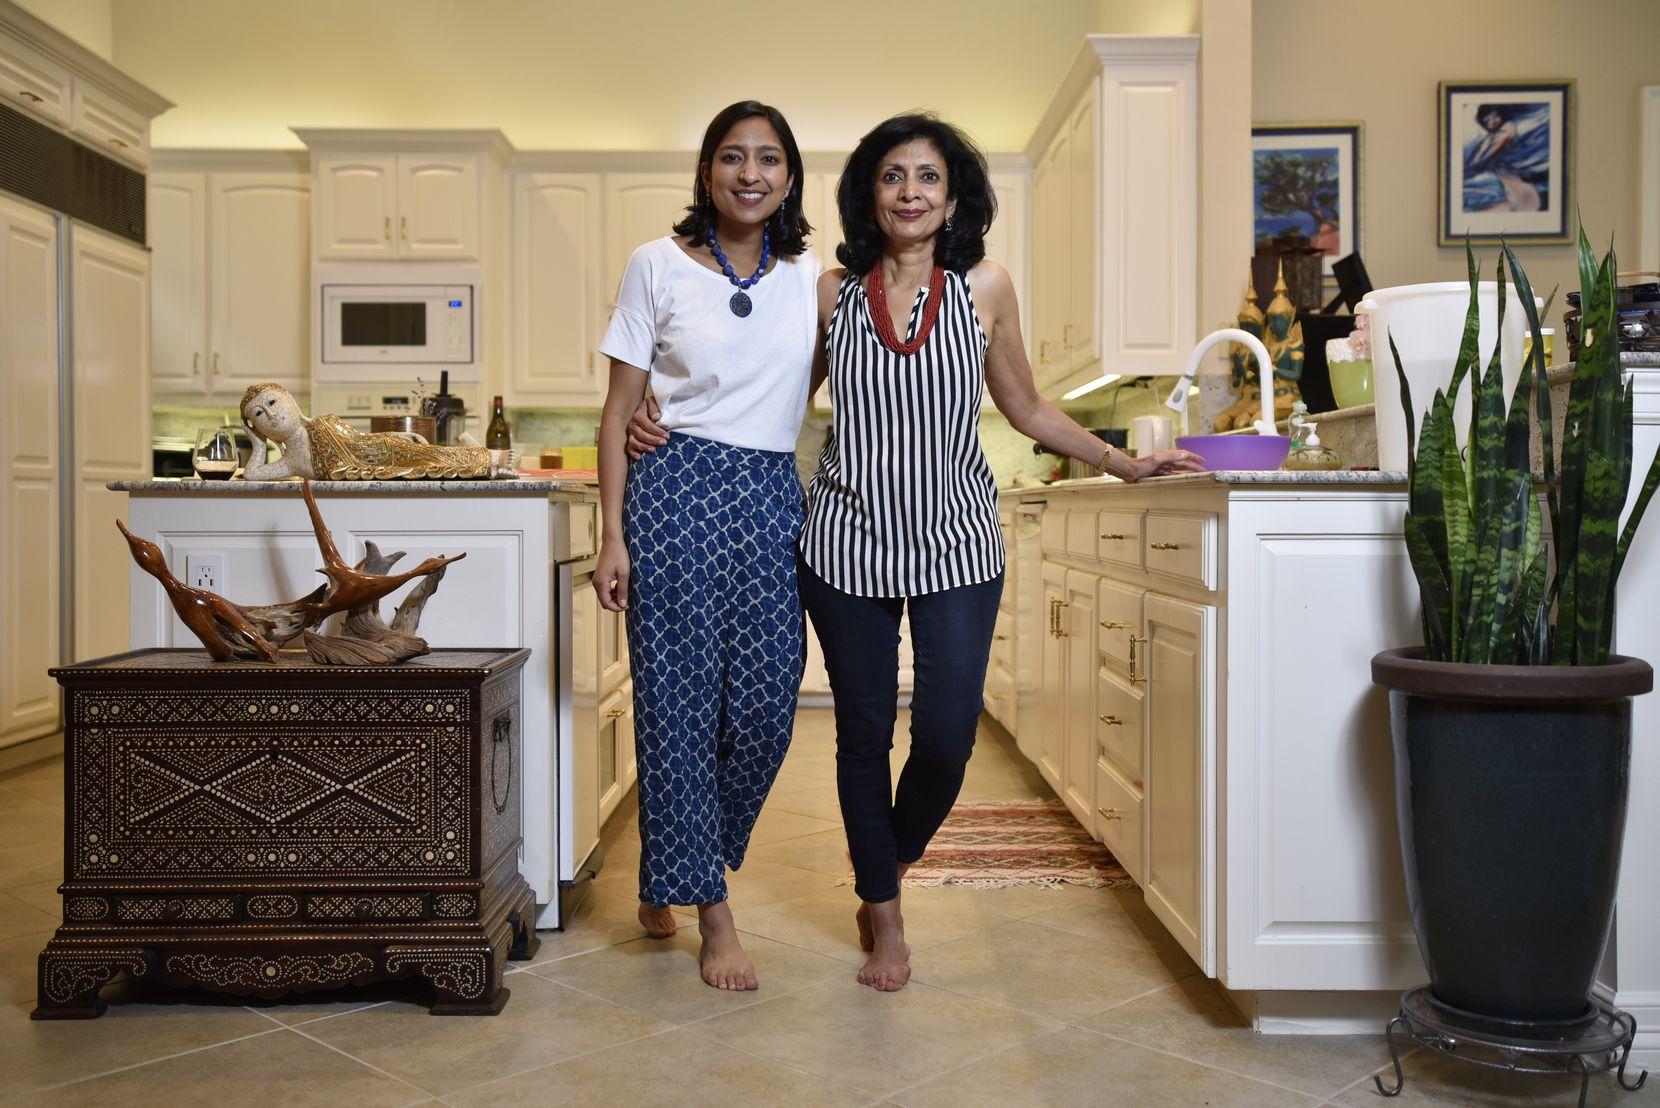 Food writer and Dallas native Priya Krishna, left, and her mother, Ritu Krishna, at Priya's family home in Dallas